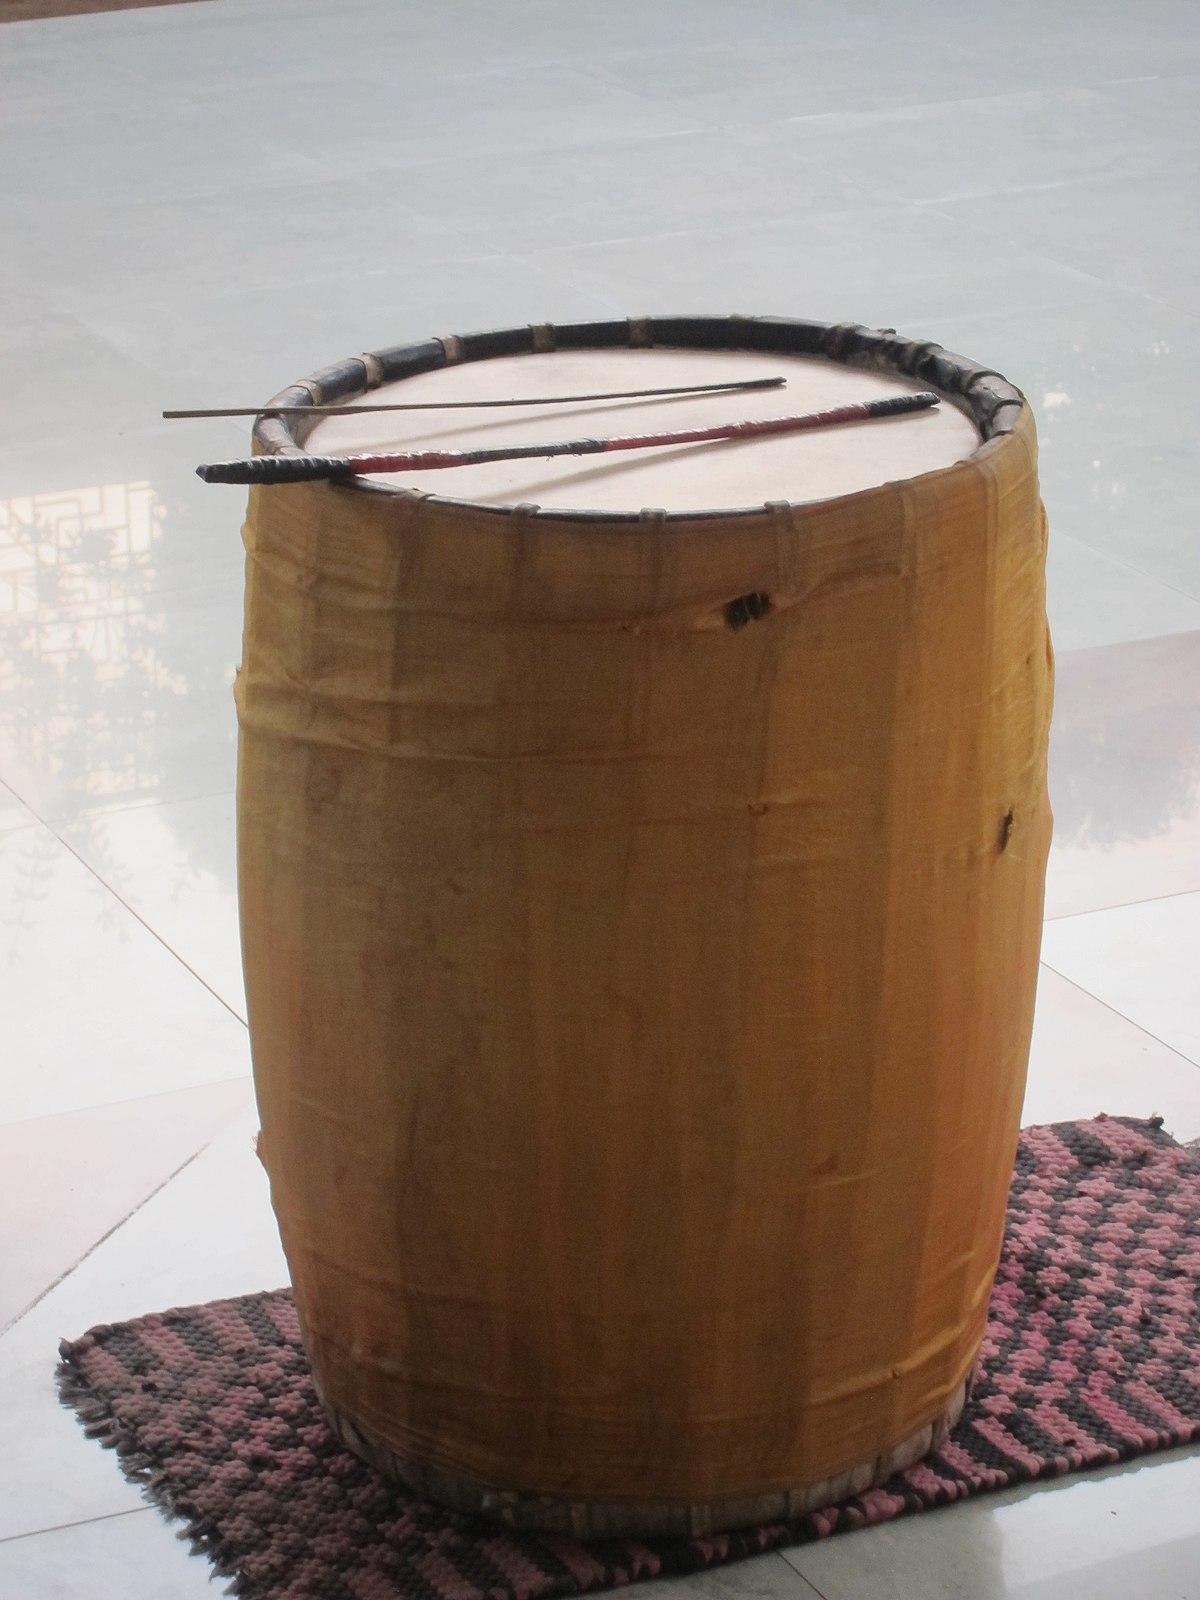 Dhak Instrument Wikipedia